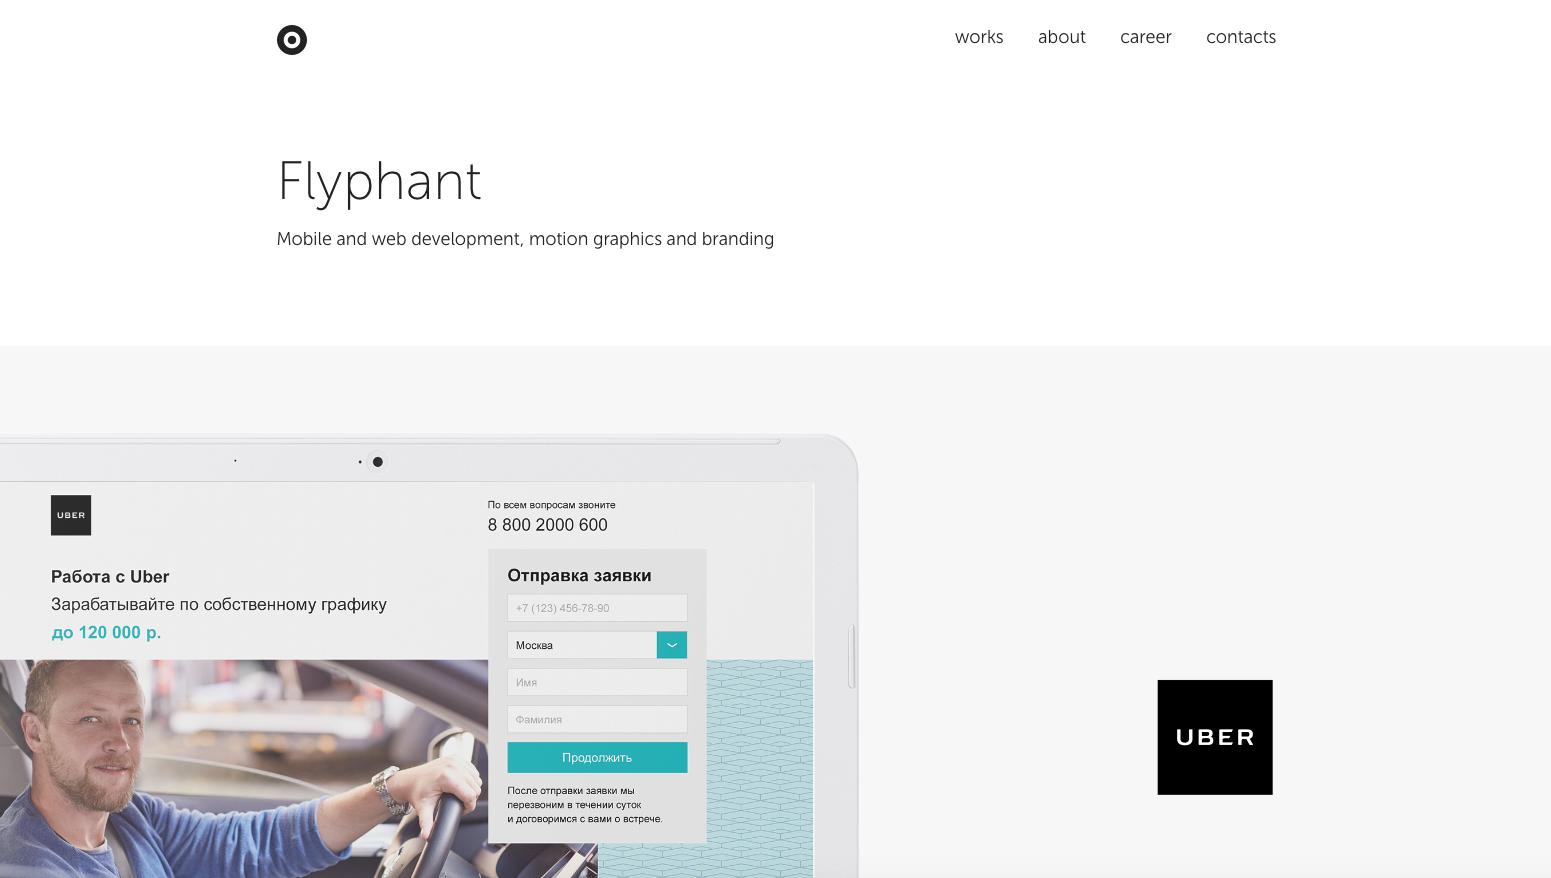 Flyphant - Moscow - Agency - Digital